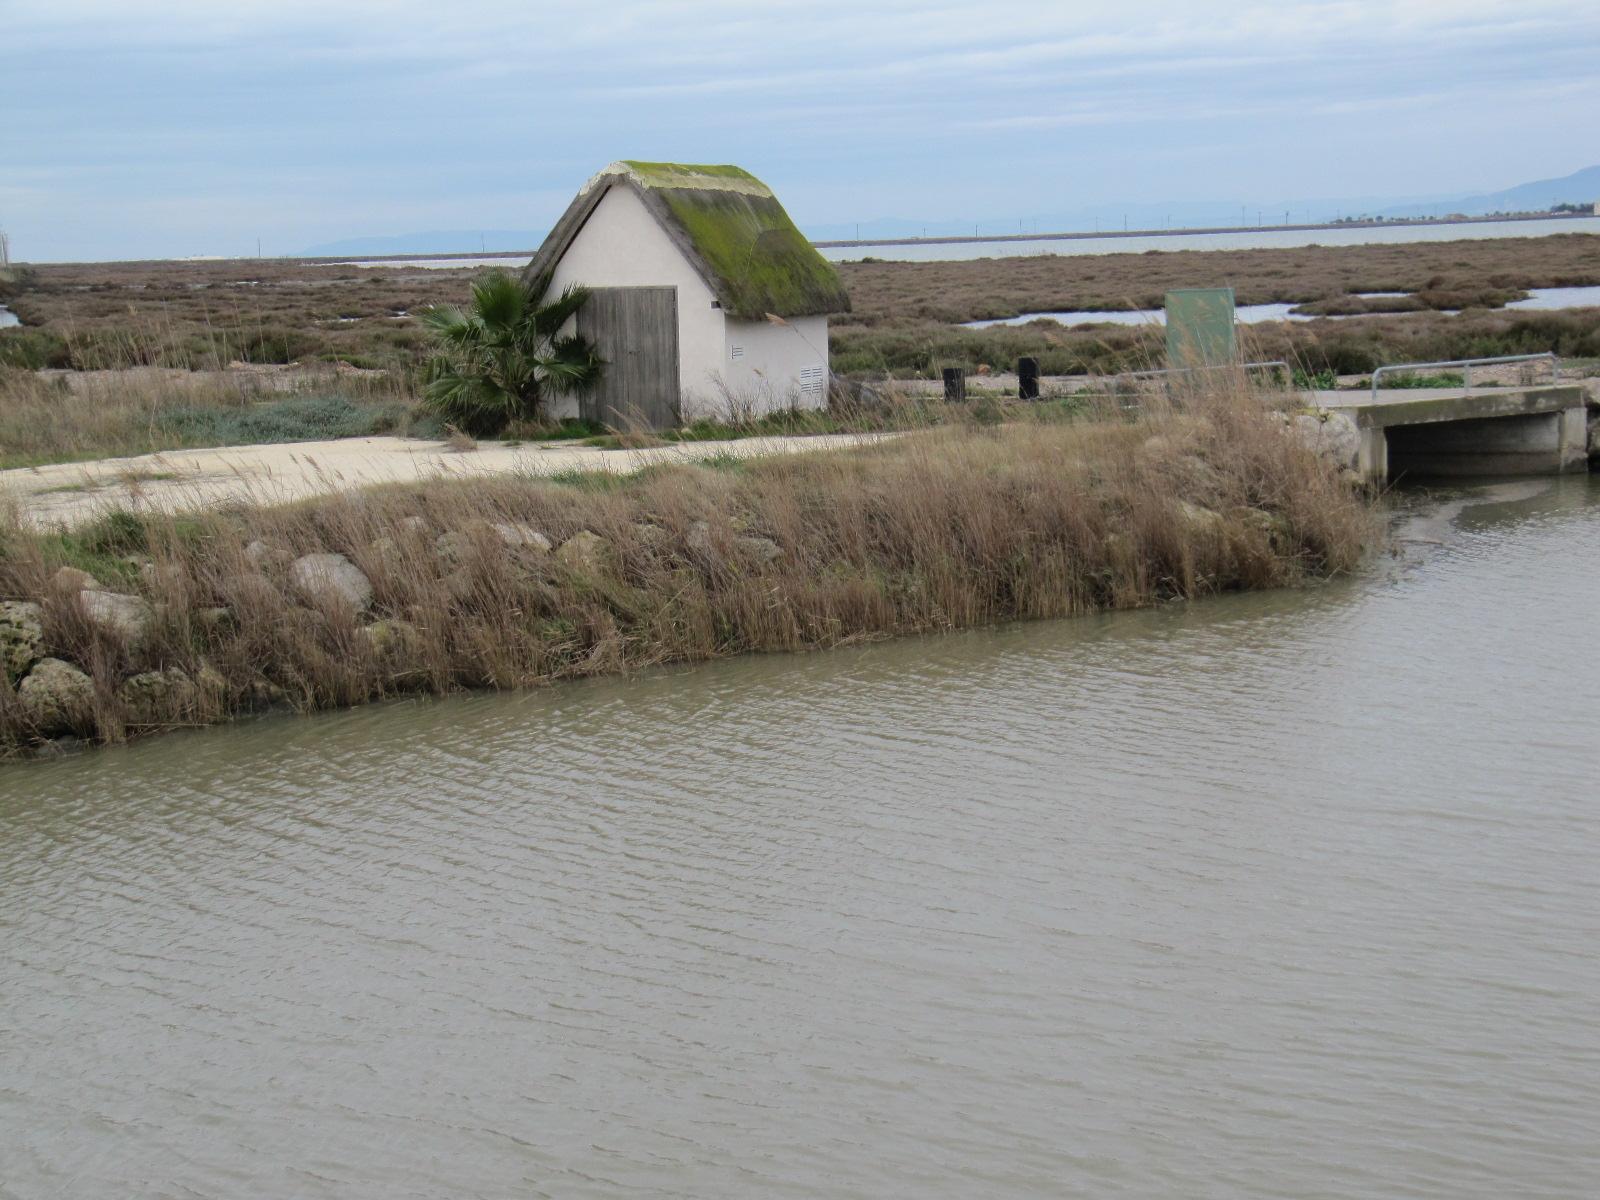 Foto playa El Trabucador. Vogelwachtershuisje Ebrodelta